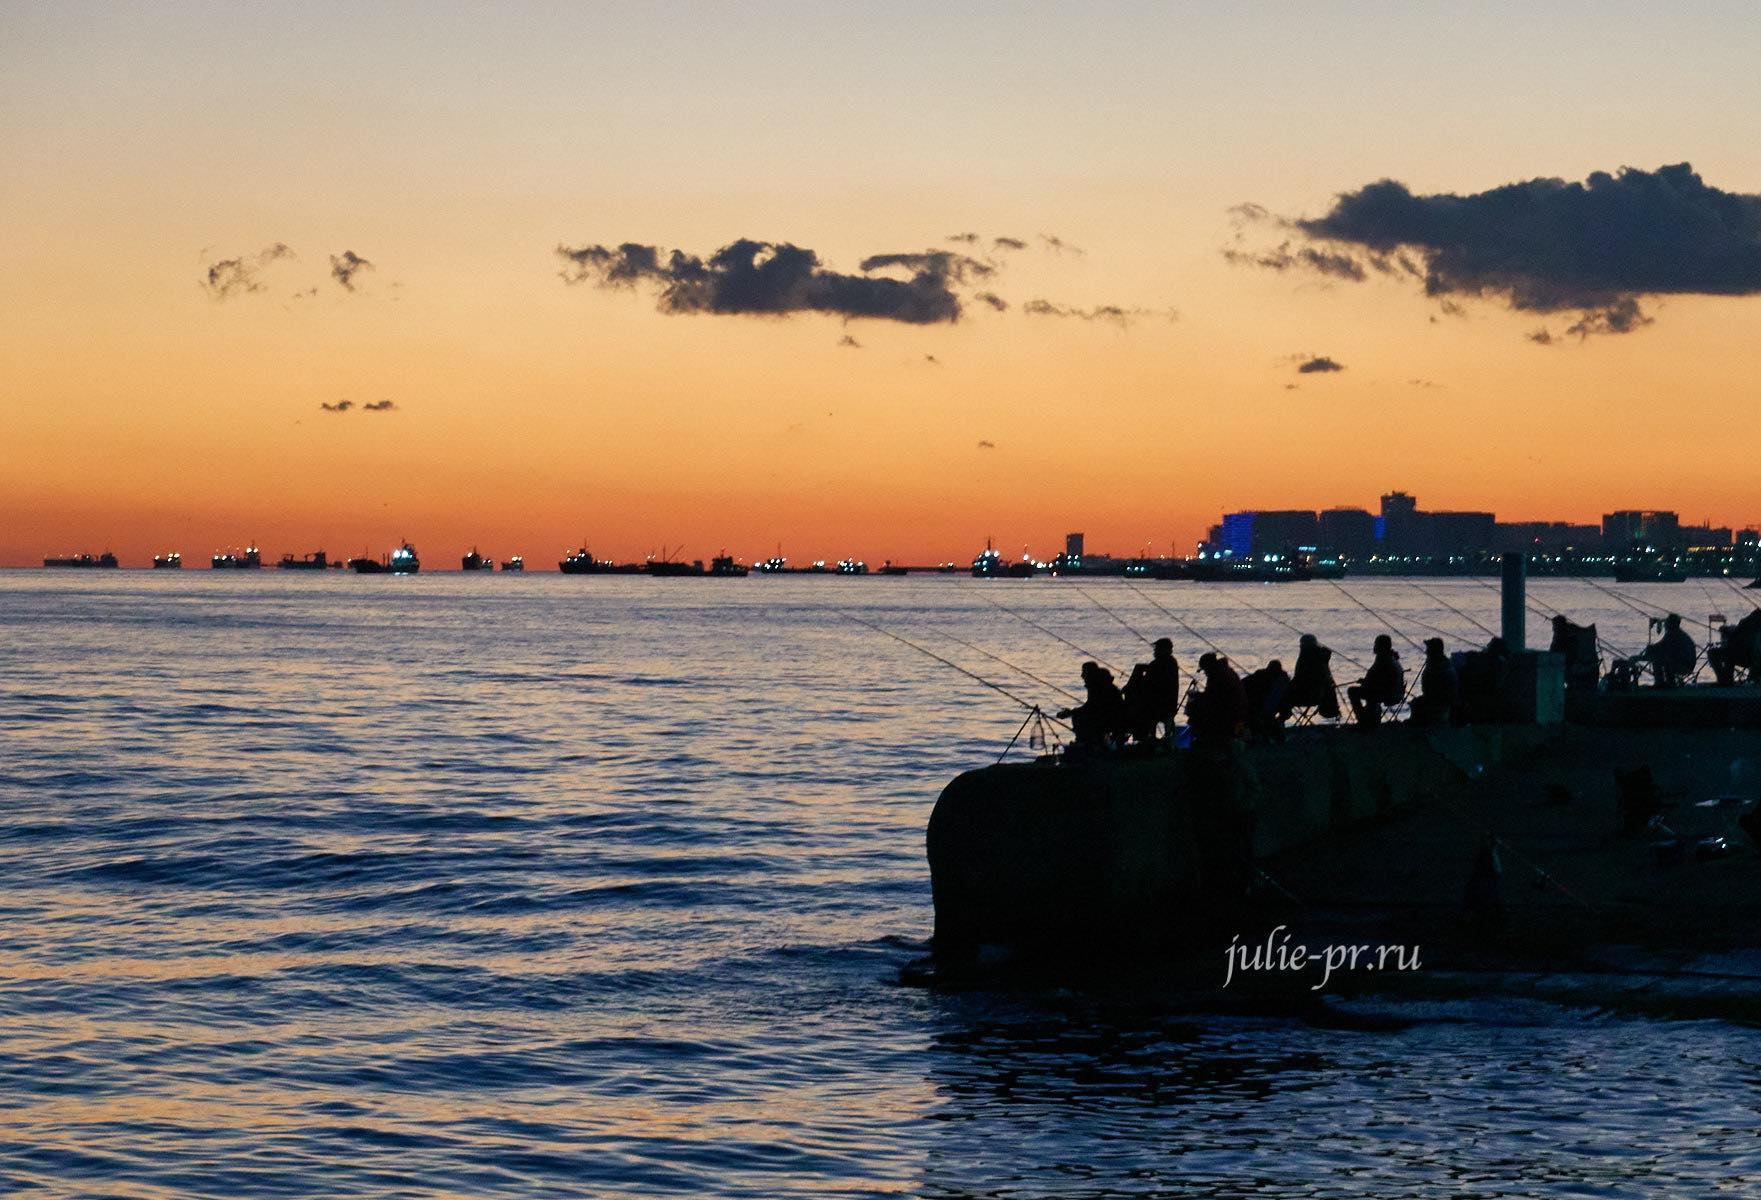 Турция, Стамбул, Рыбаки